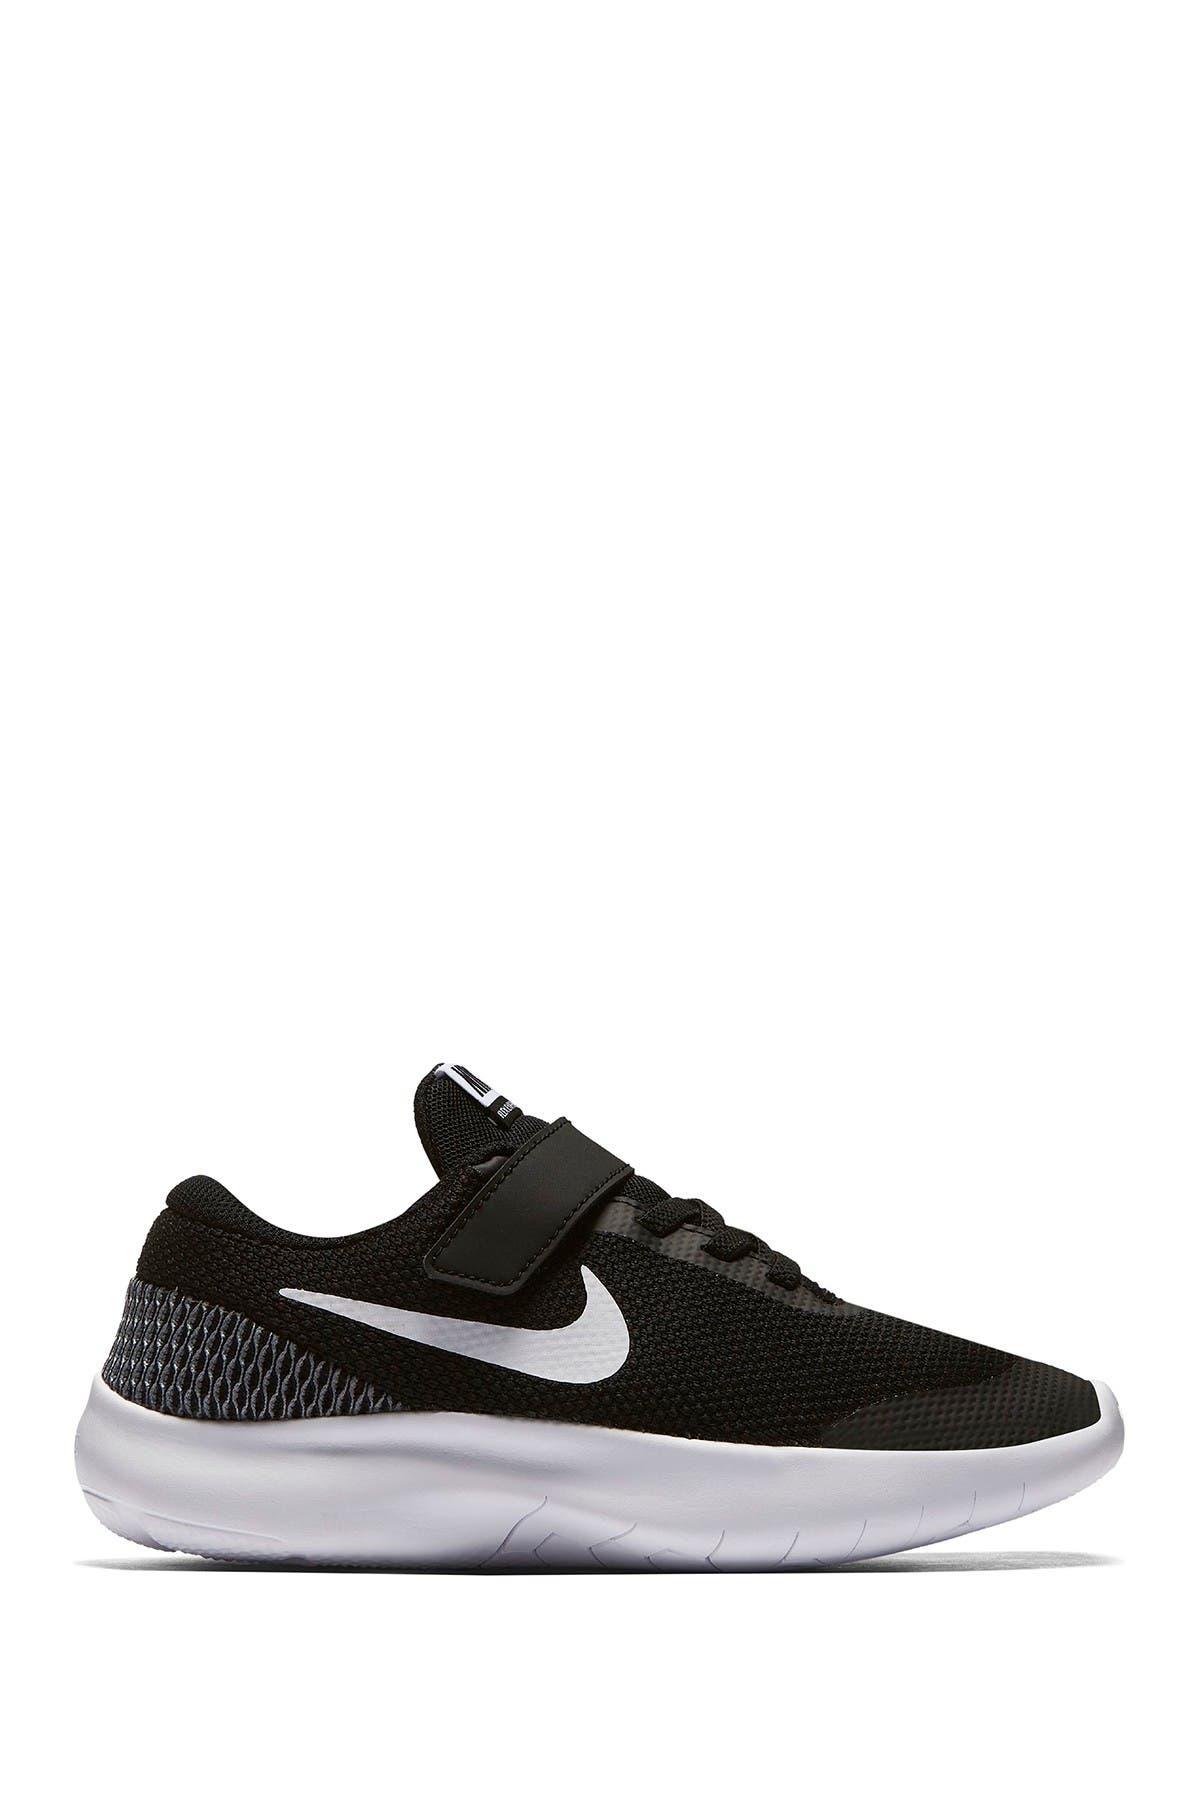 Image of Nike Flex Experience RN 7 Sneaker